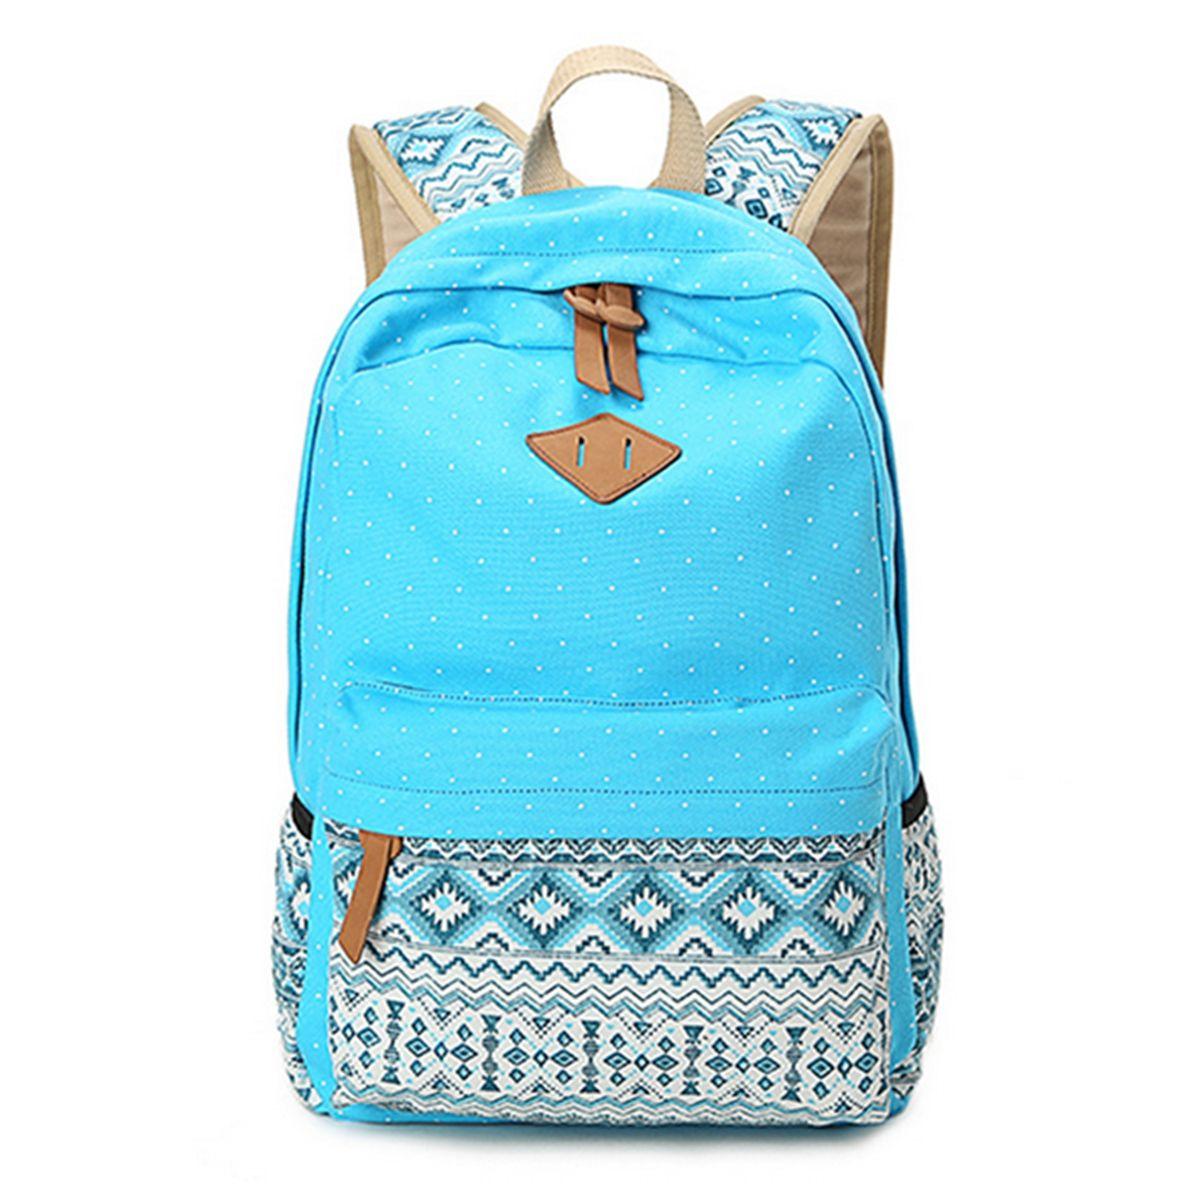 Monorose print backpack - Nude Pink | Bags | Ted Baker ...